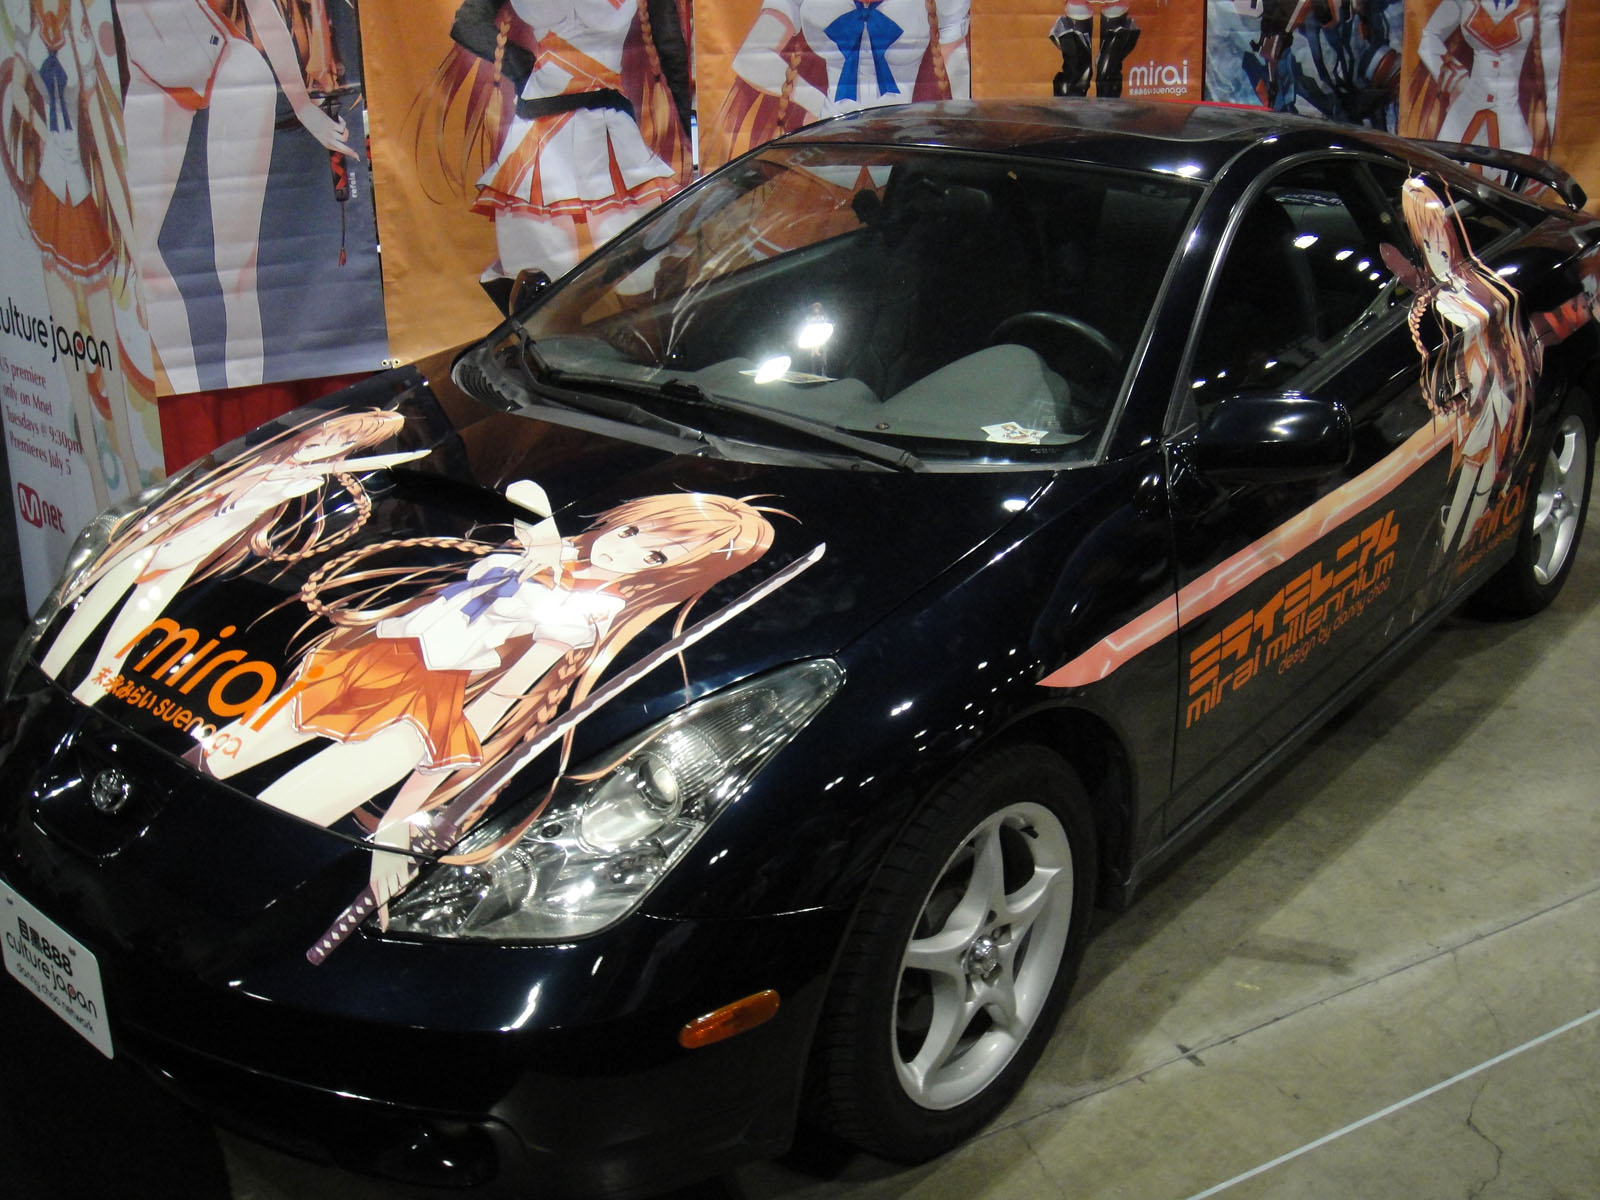 File:Mirai Suenaga itasha of Culture Japan booth, Anime Expo